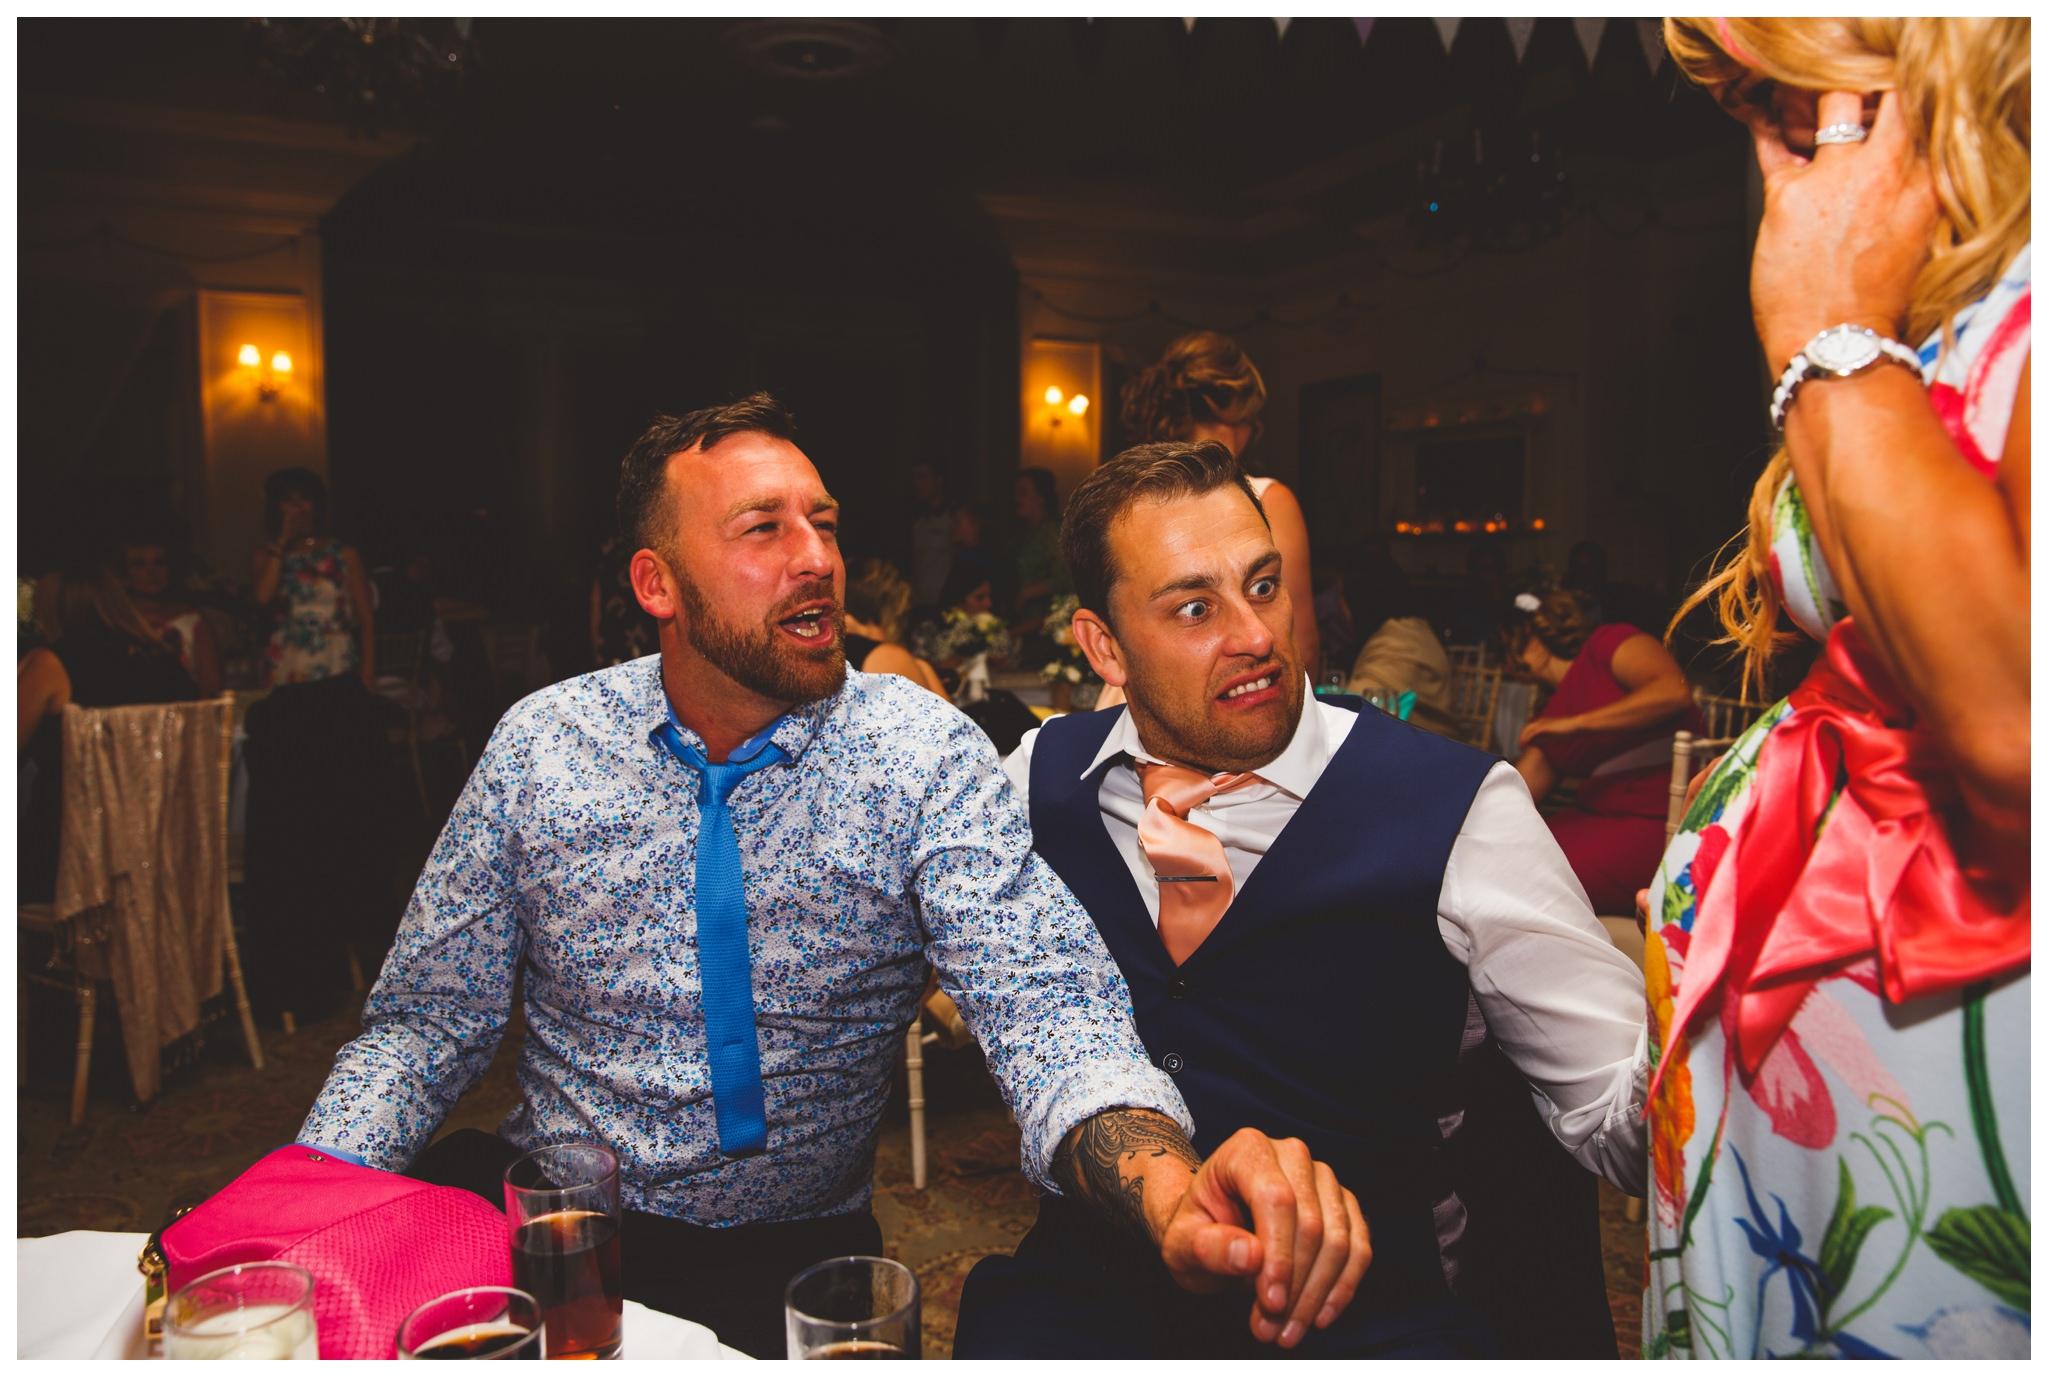 Richard Savage Photography - Wedding - Peterstone Court Brecon - 2016-05-11_0067